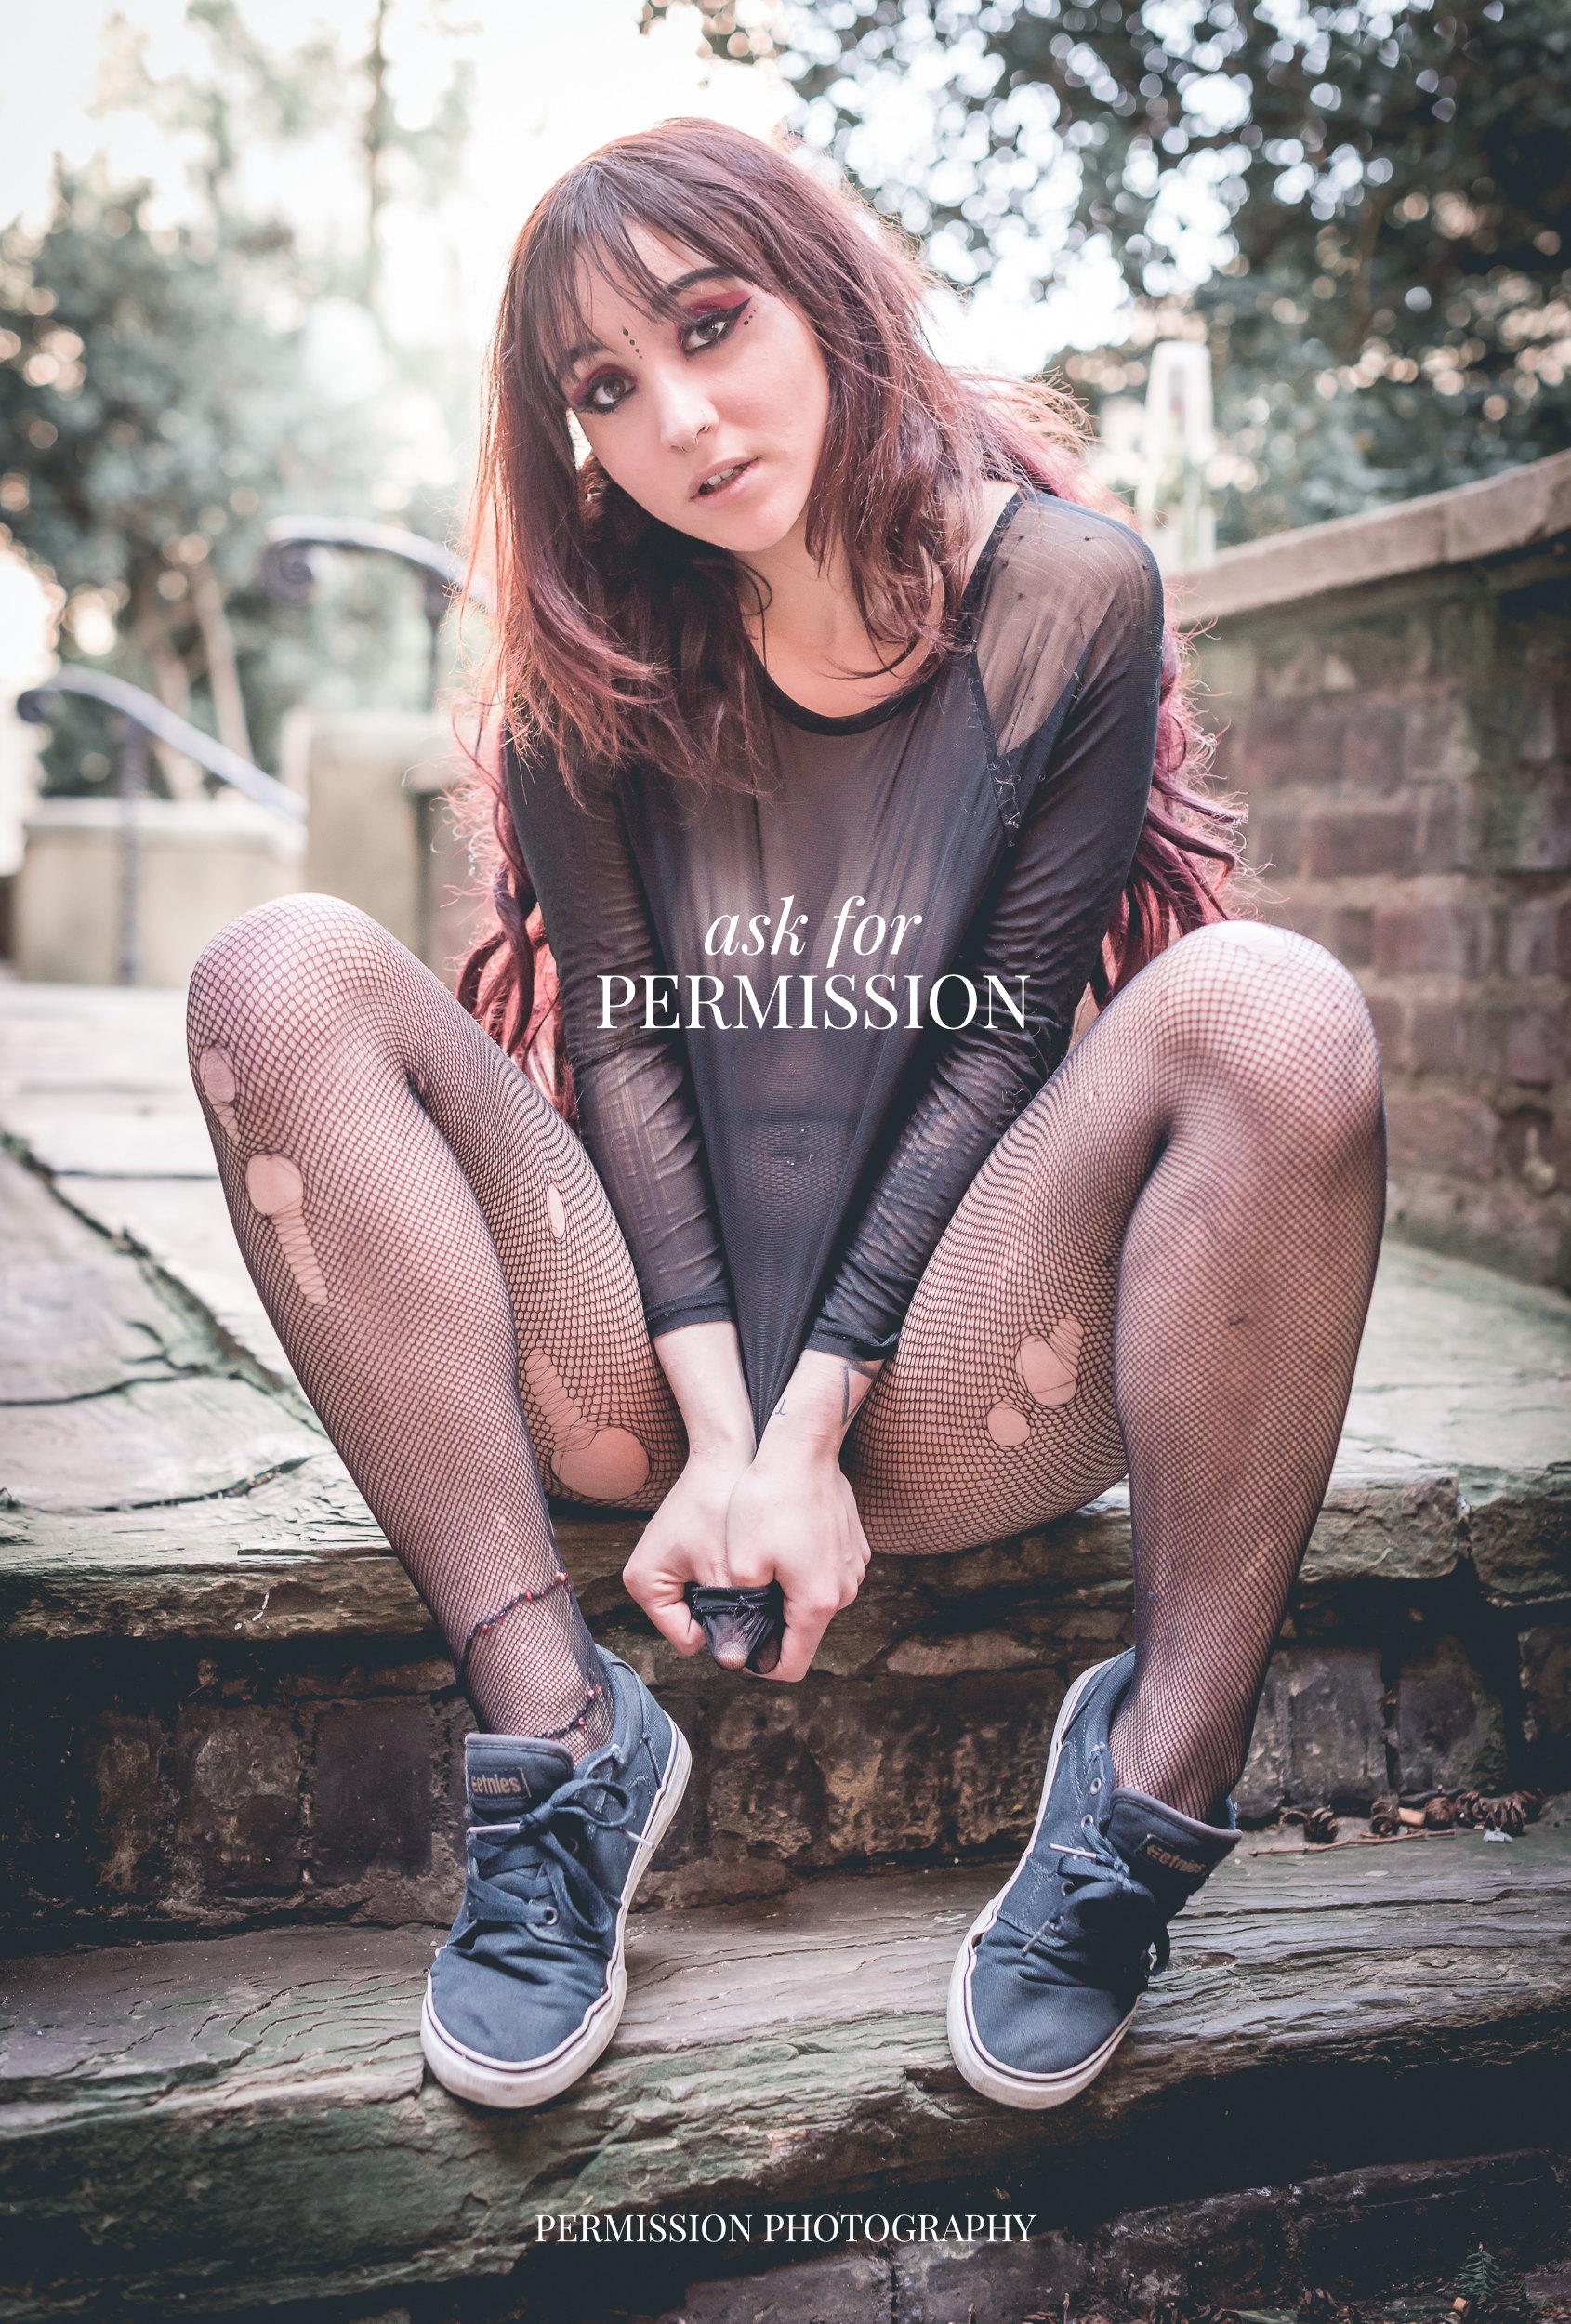 Permission Photography